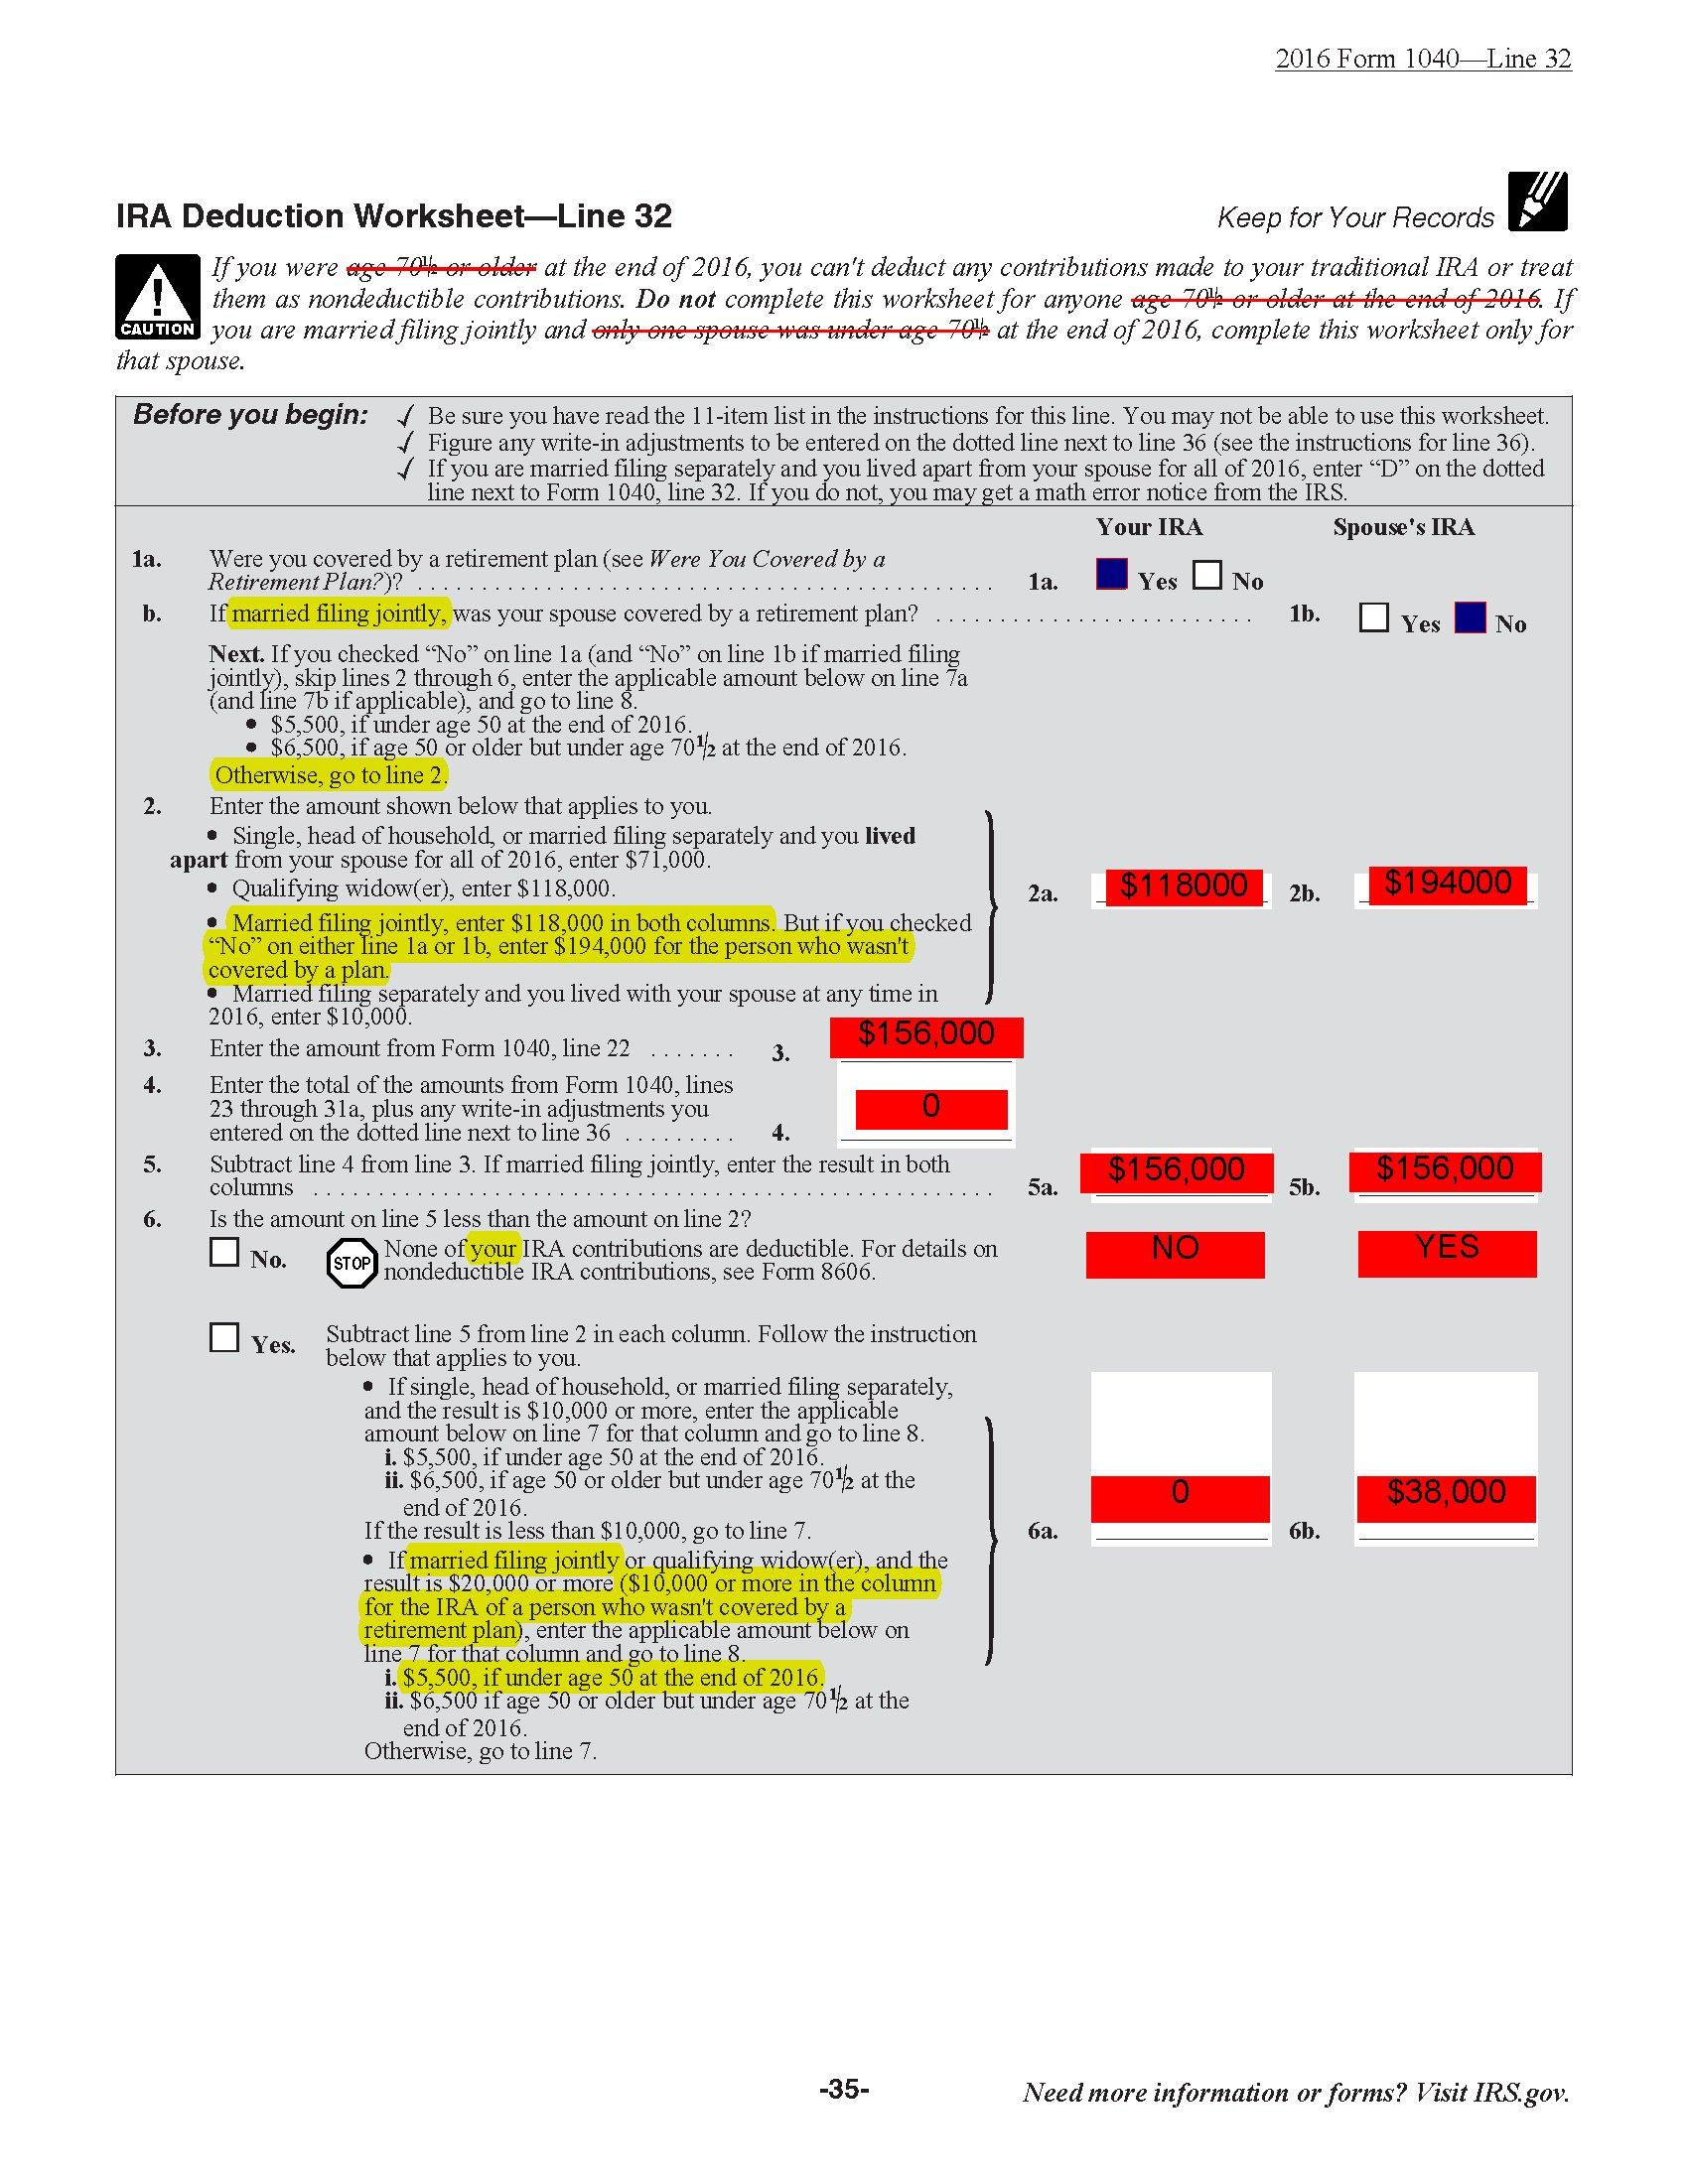 Ira Deduction Worksheet  Yooob For Ira Deduction Worksheet 2016